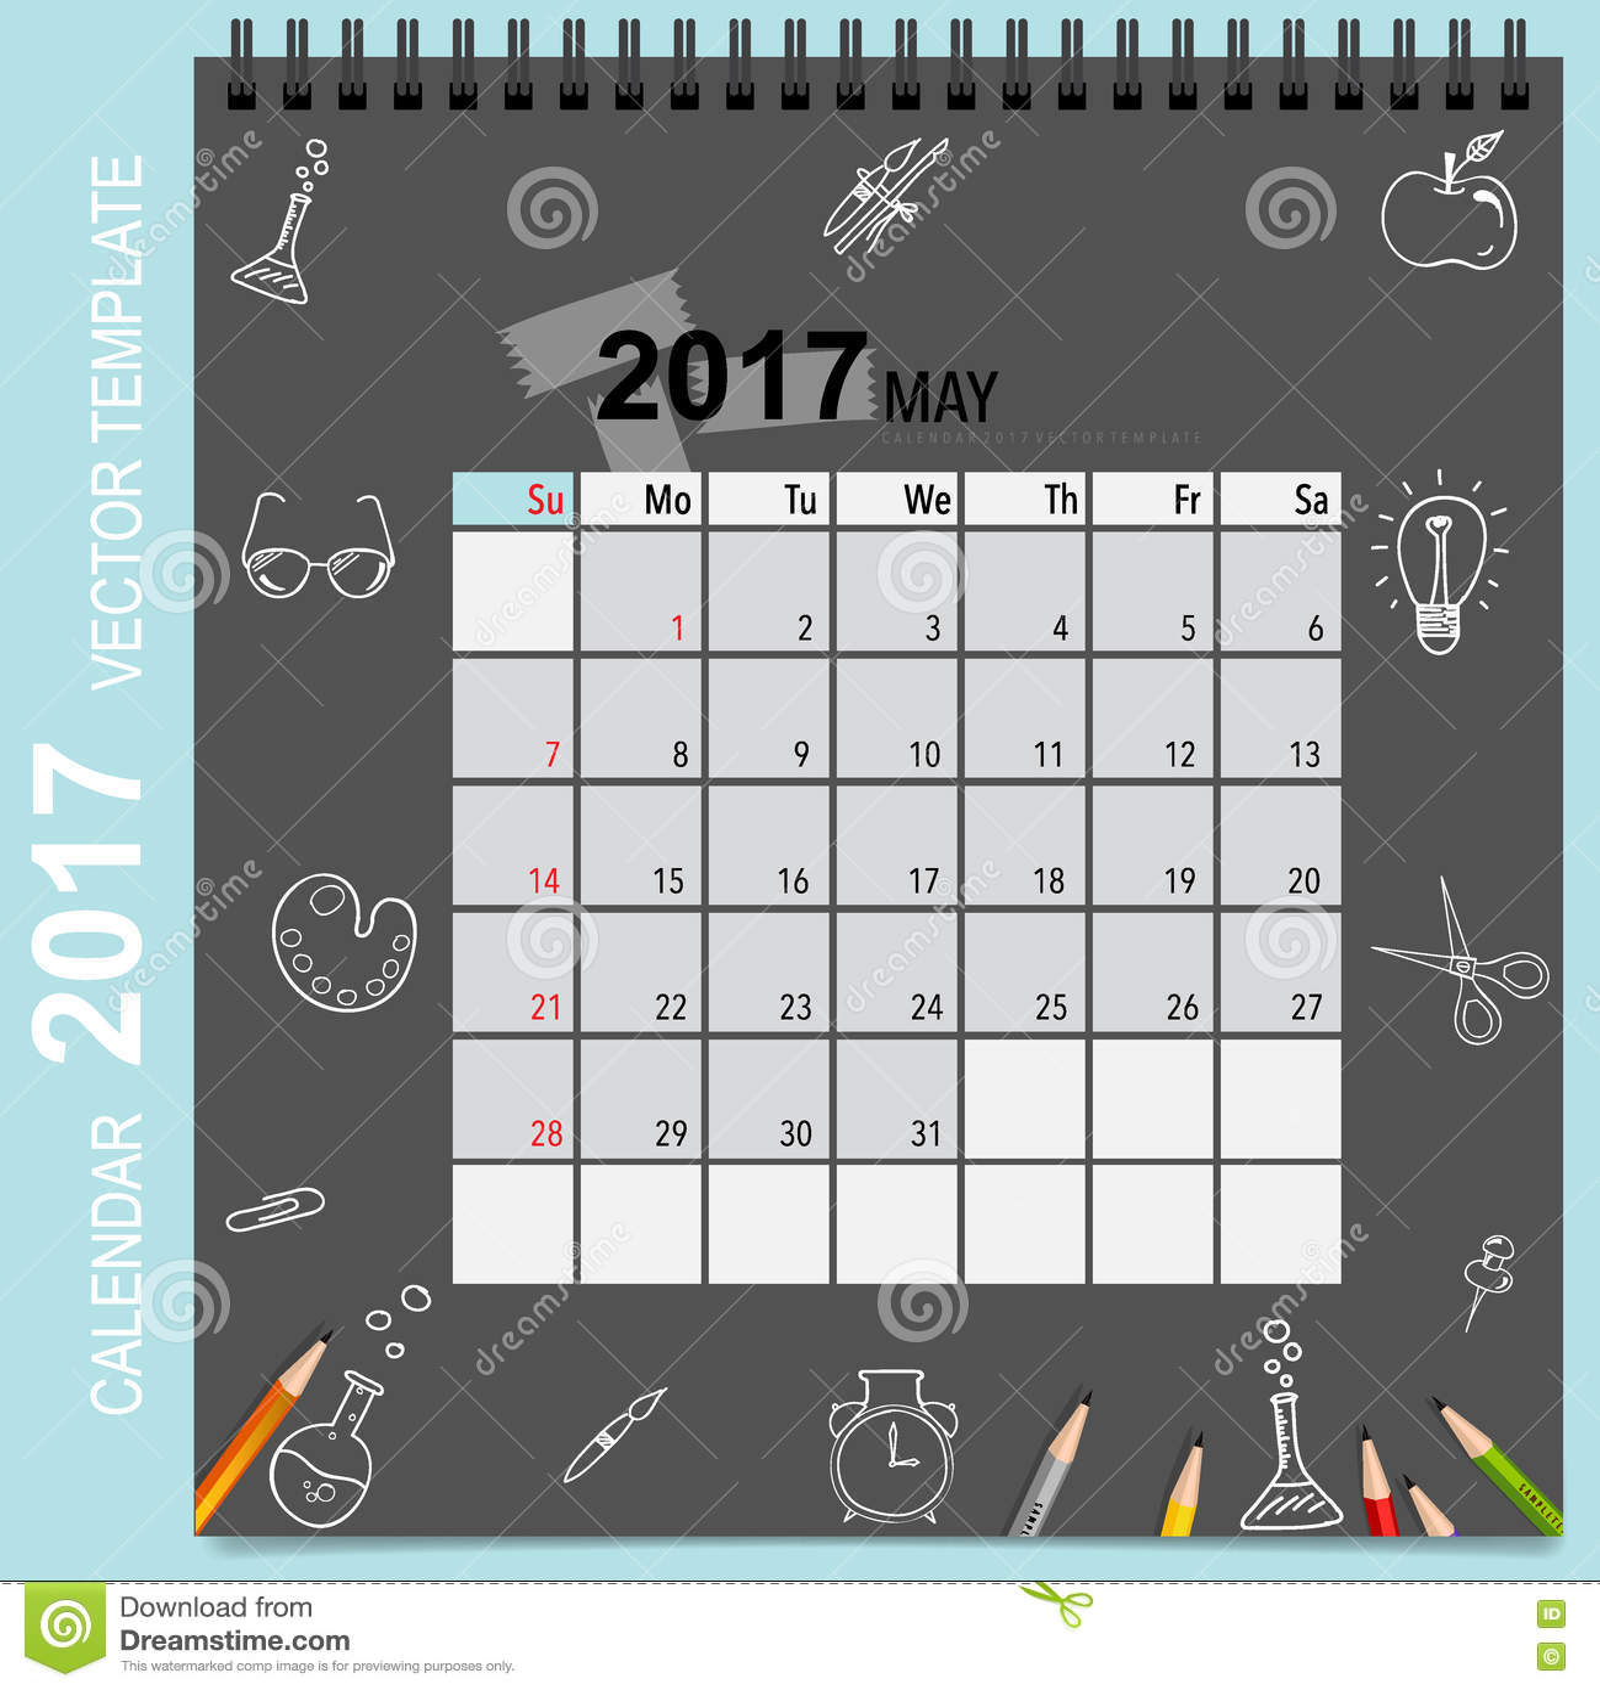 Calendar Planner Vector : Calendar planner vector design monthly